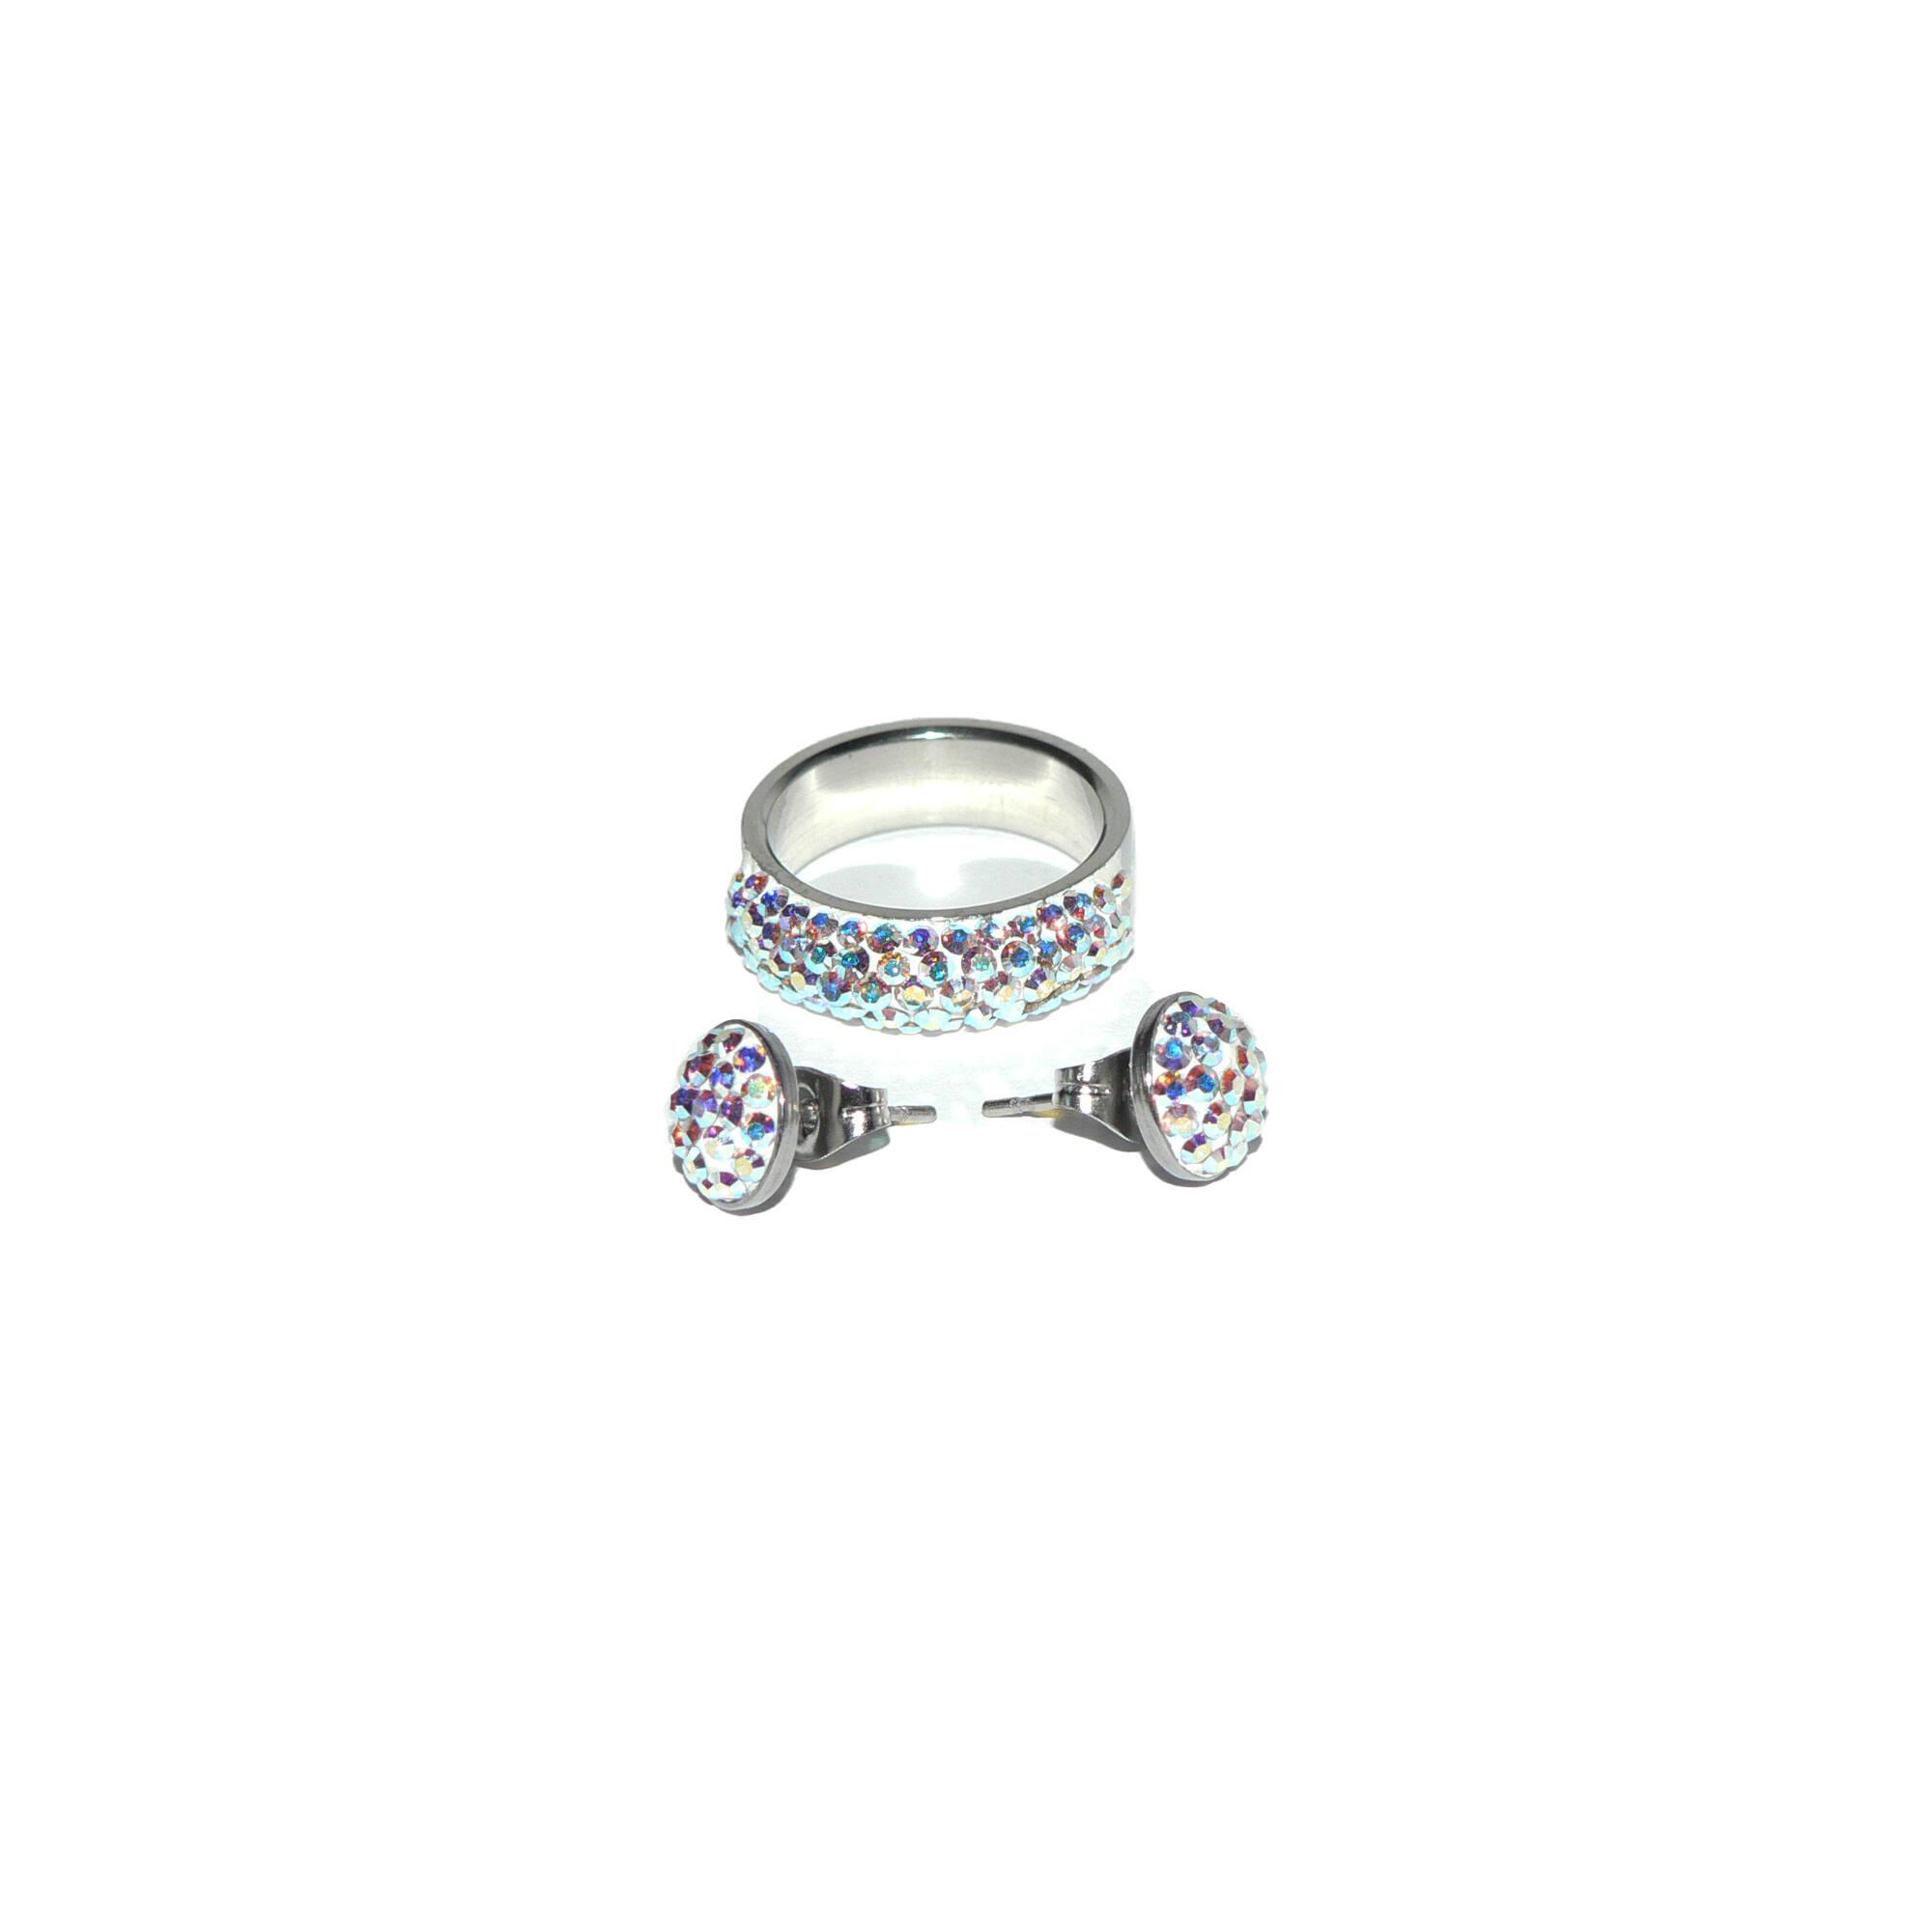 Swarovski kristályos fülbevaló gyűrűvel